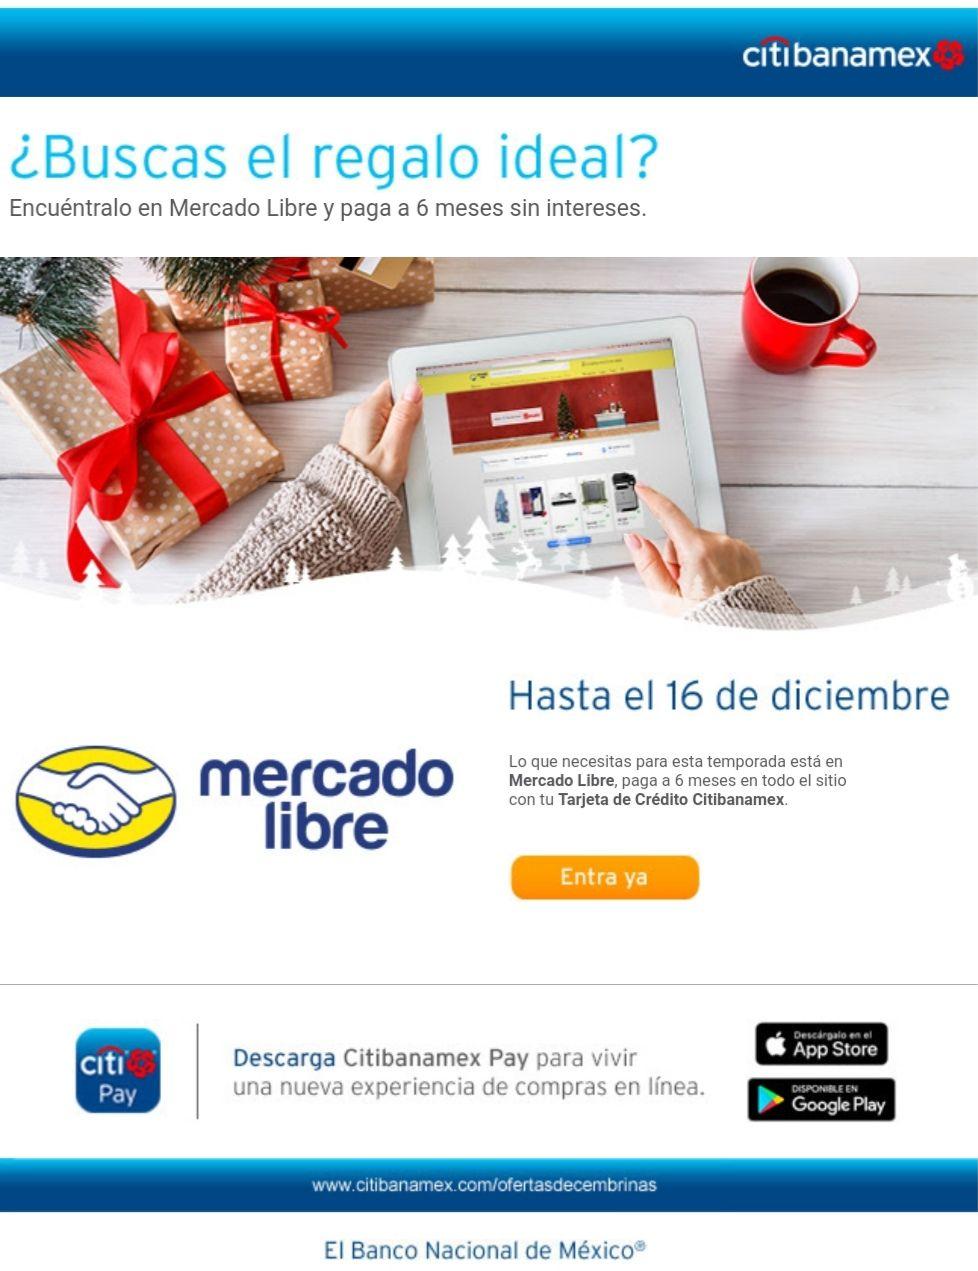 Mercado Libre: 6 MESES SIN INTERESES en pagando con Citibanamex